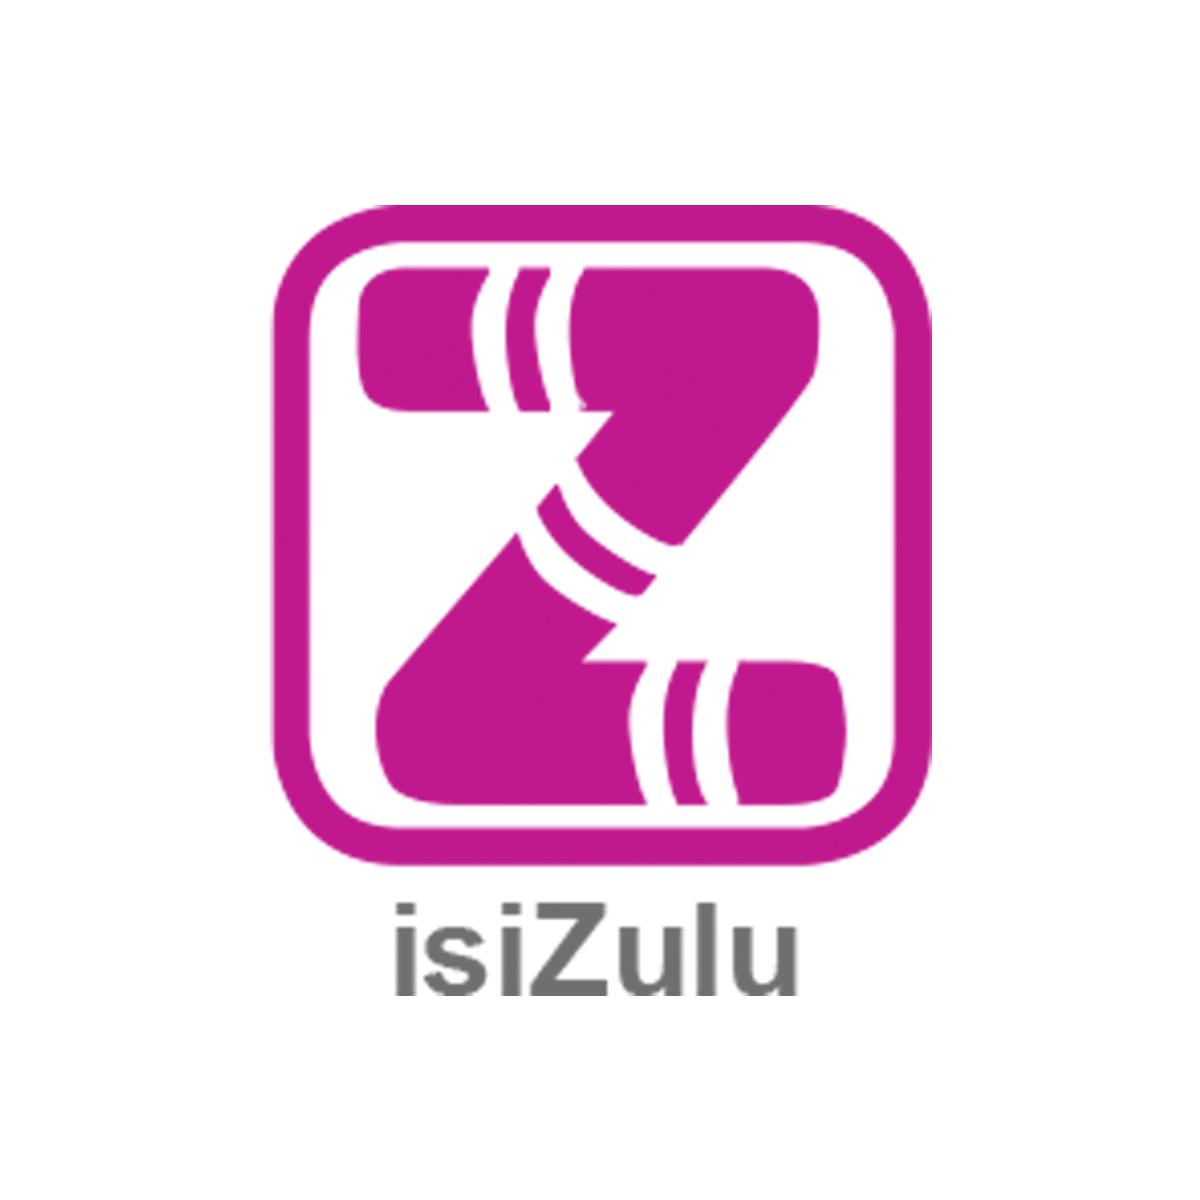 The Talking Dictionary IsiZulu